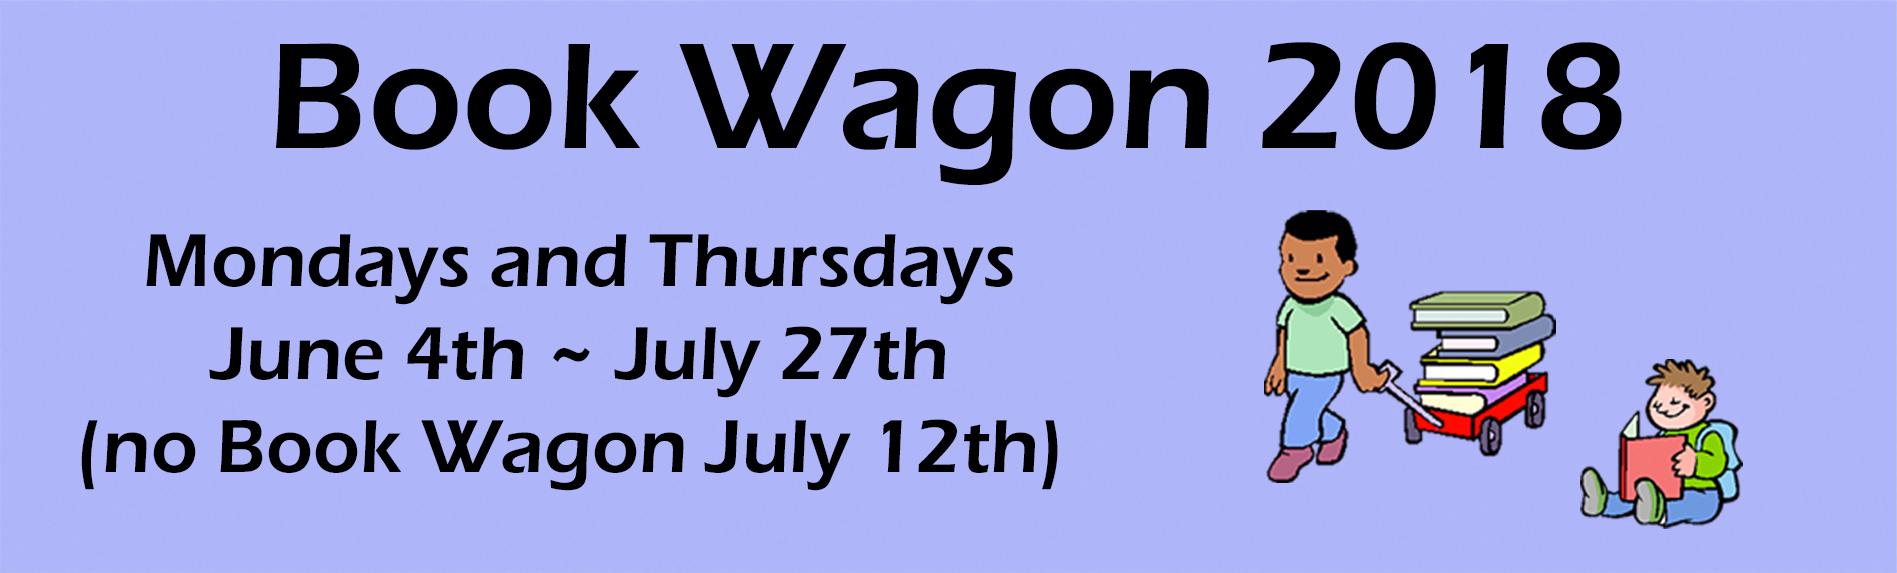 Book Wagon Schedule